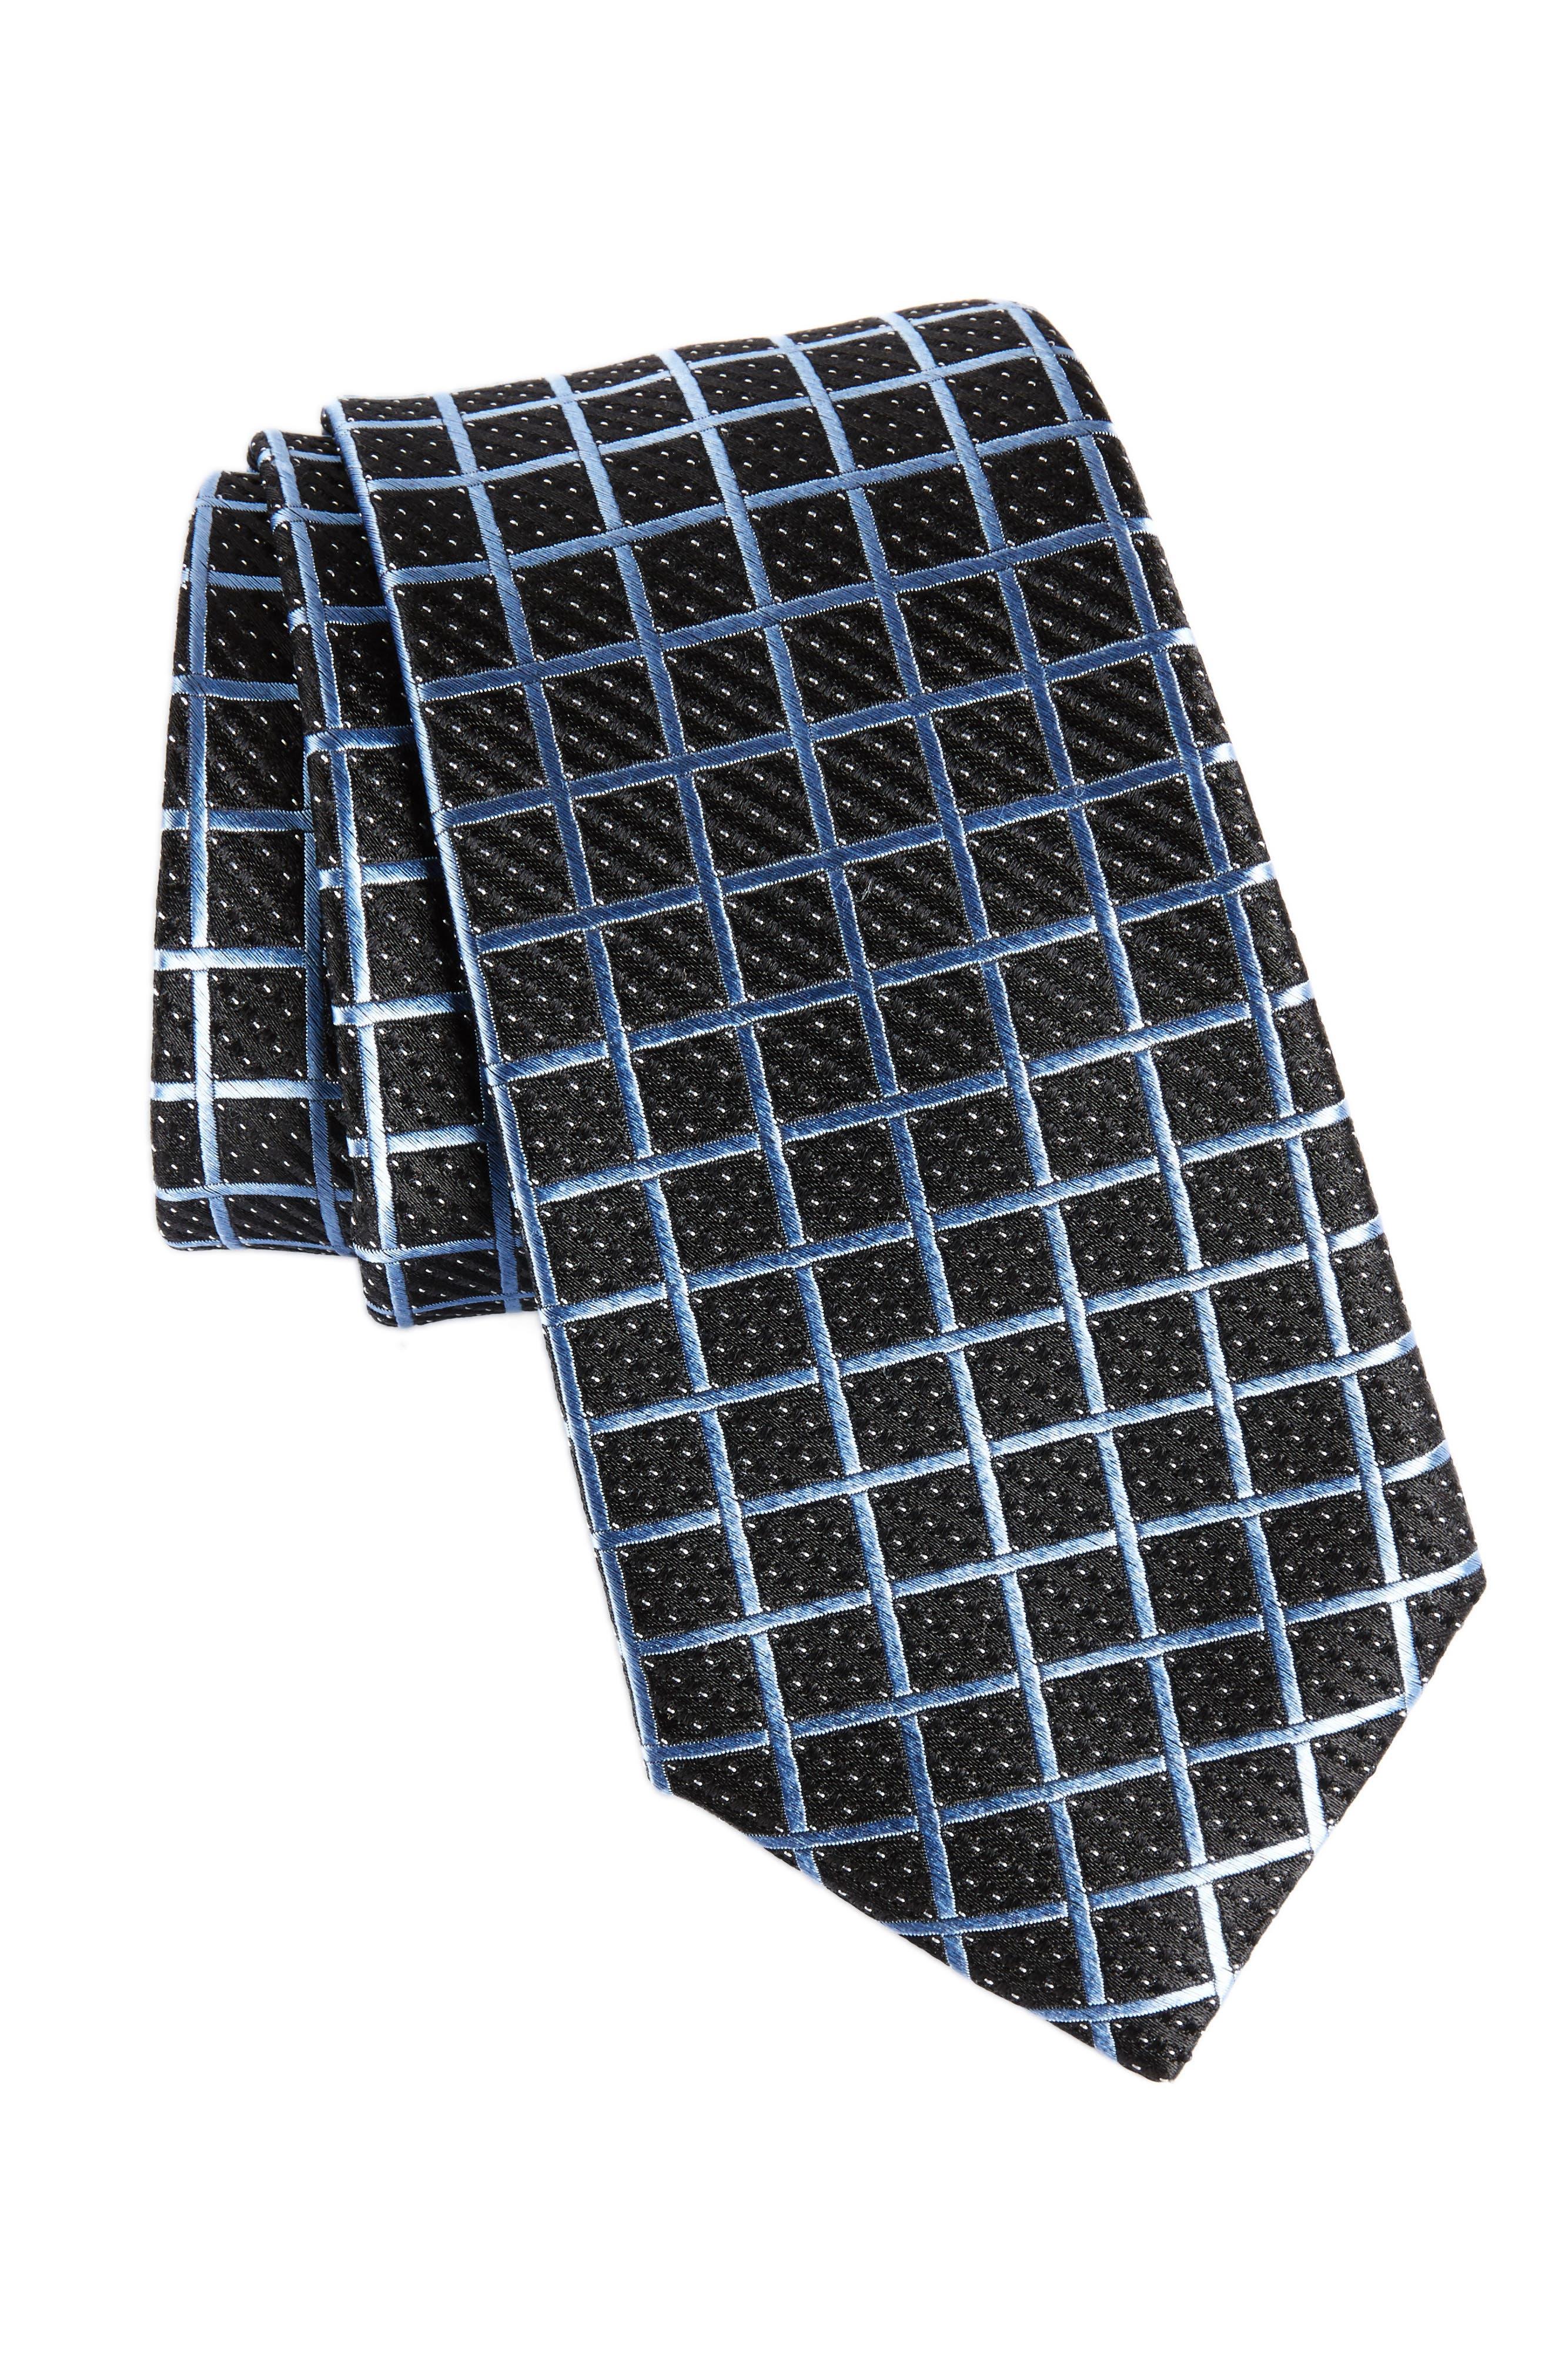 Main Image - Nordstrom Men's Shop Check Silk Tie (X-Long)